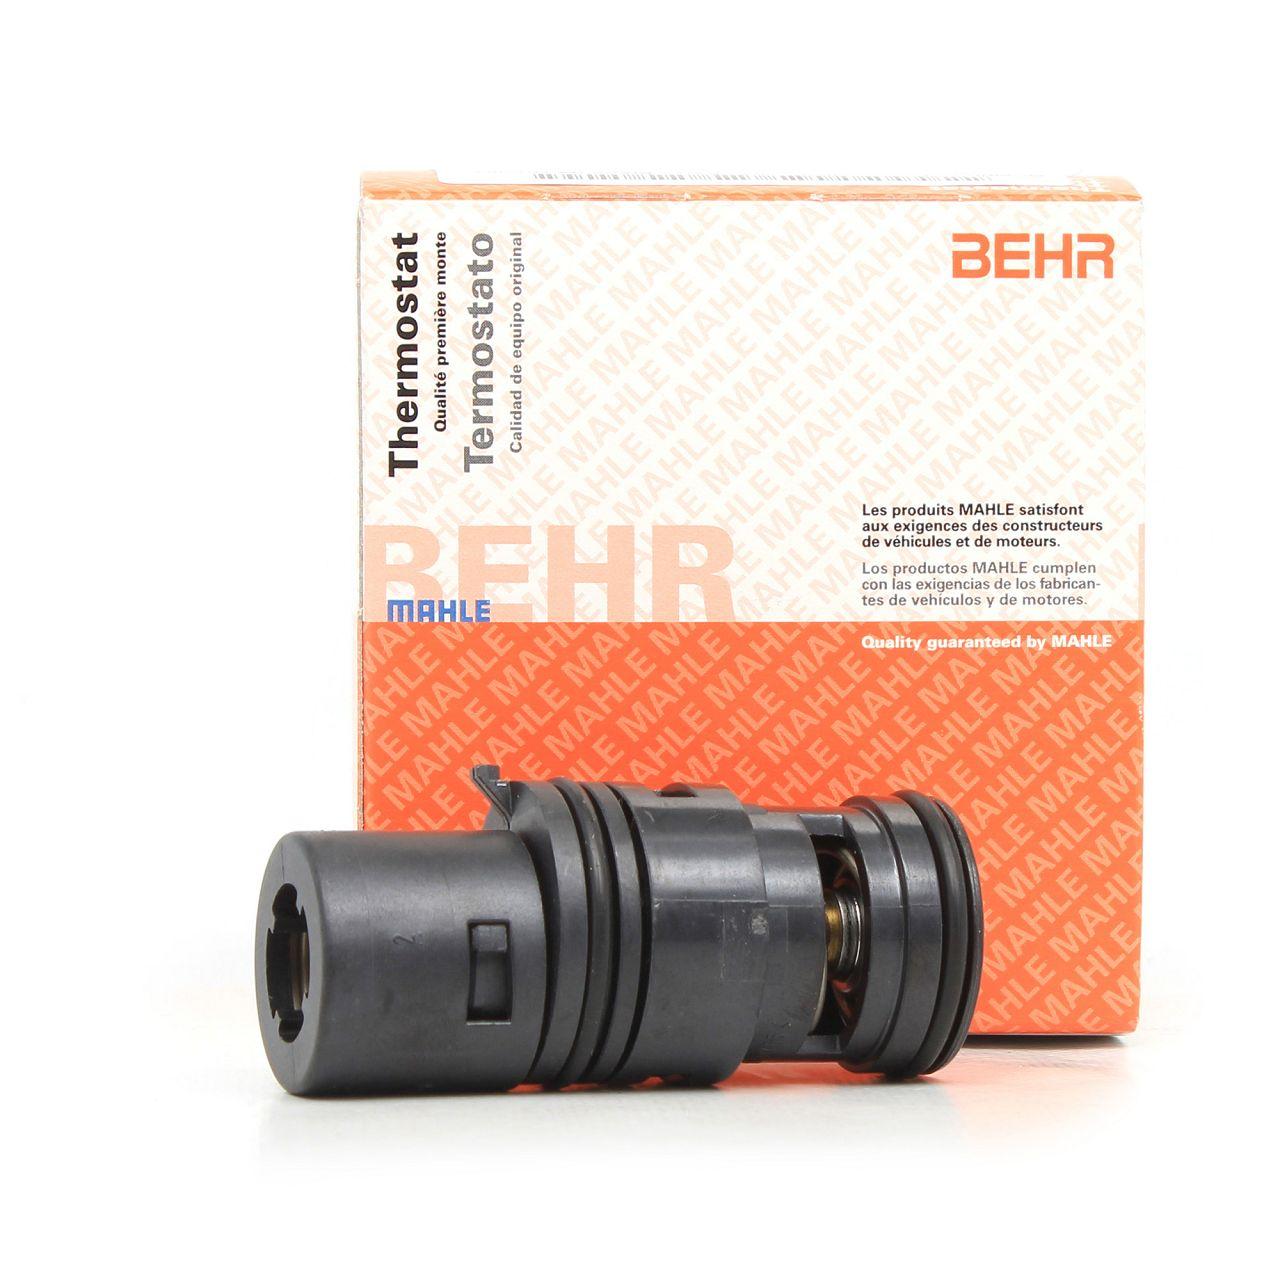 BEHR MAHLE TO780 Thermostat Ölthermostat für BMW E46 316-330i X3 E83 X5 E53 Z4